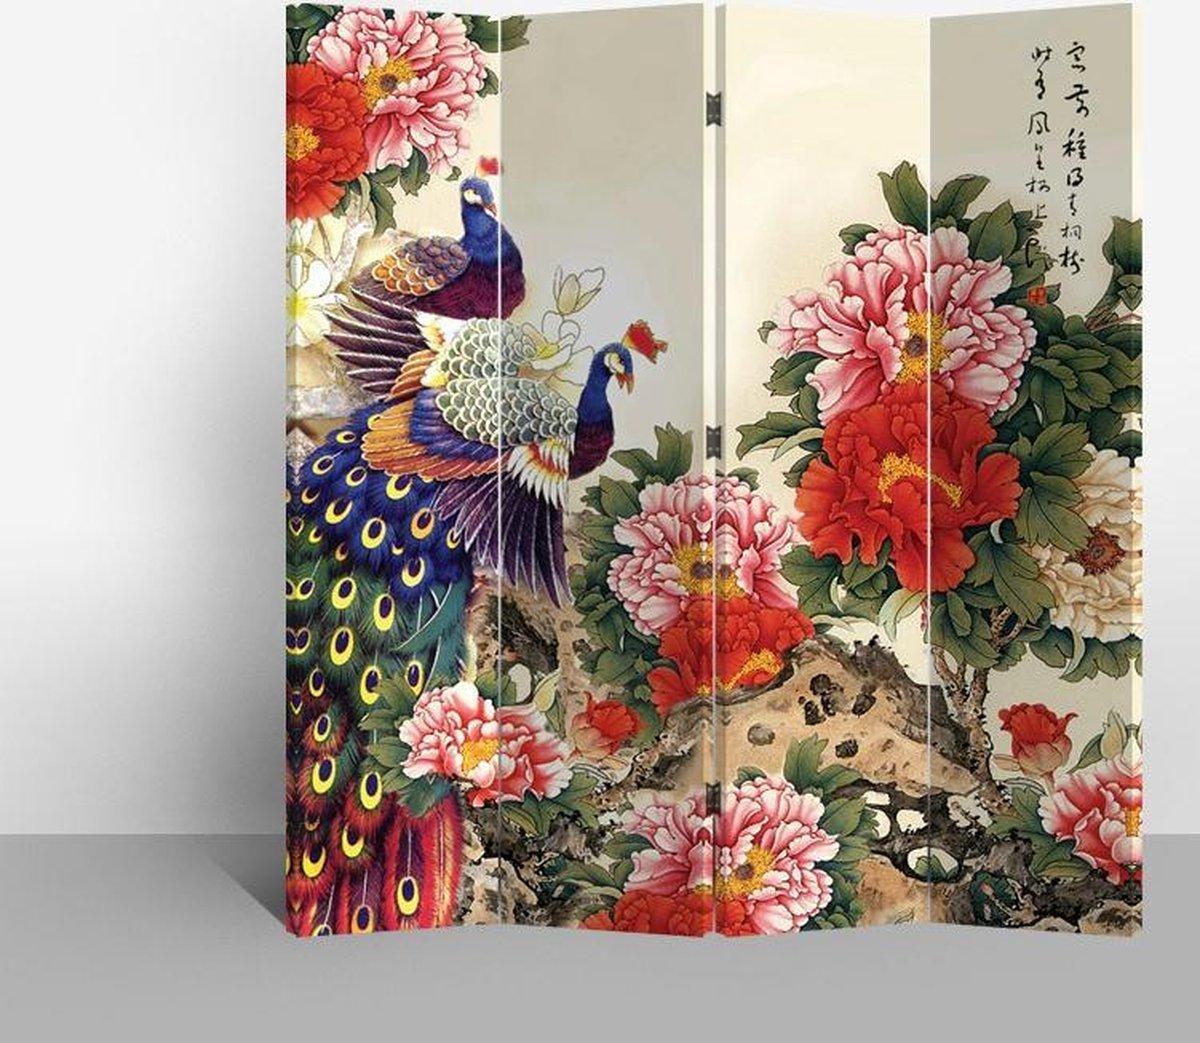 Orientique Kamerscherm 4 Panelen Pauwen met Rode Bloemen Canvas Room Divider Scheidingswand - Orientique